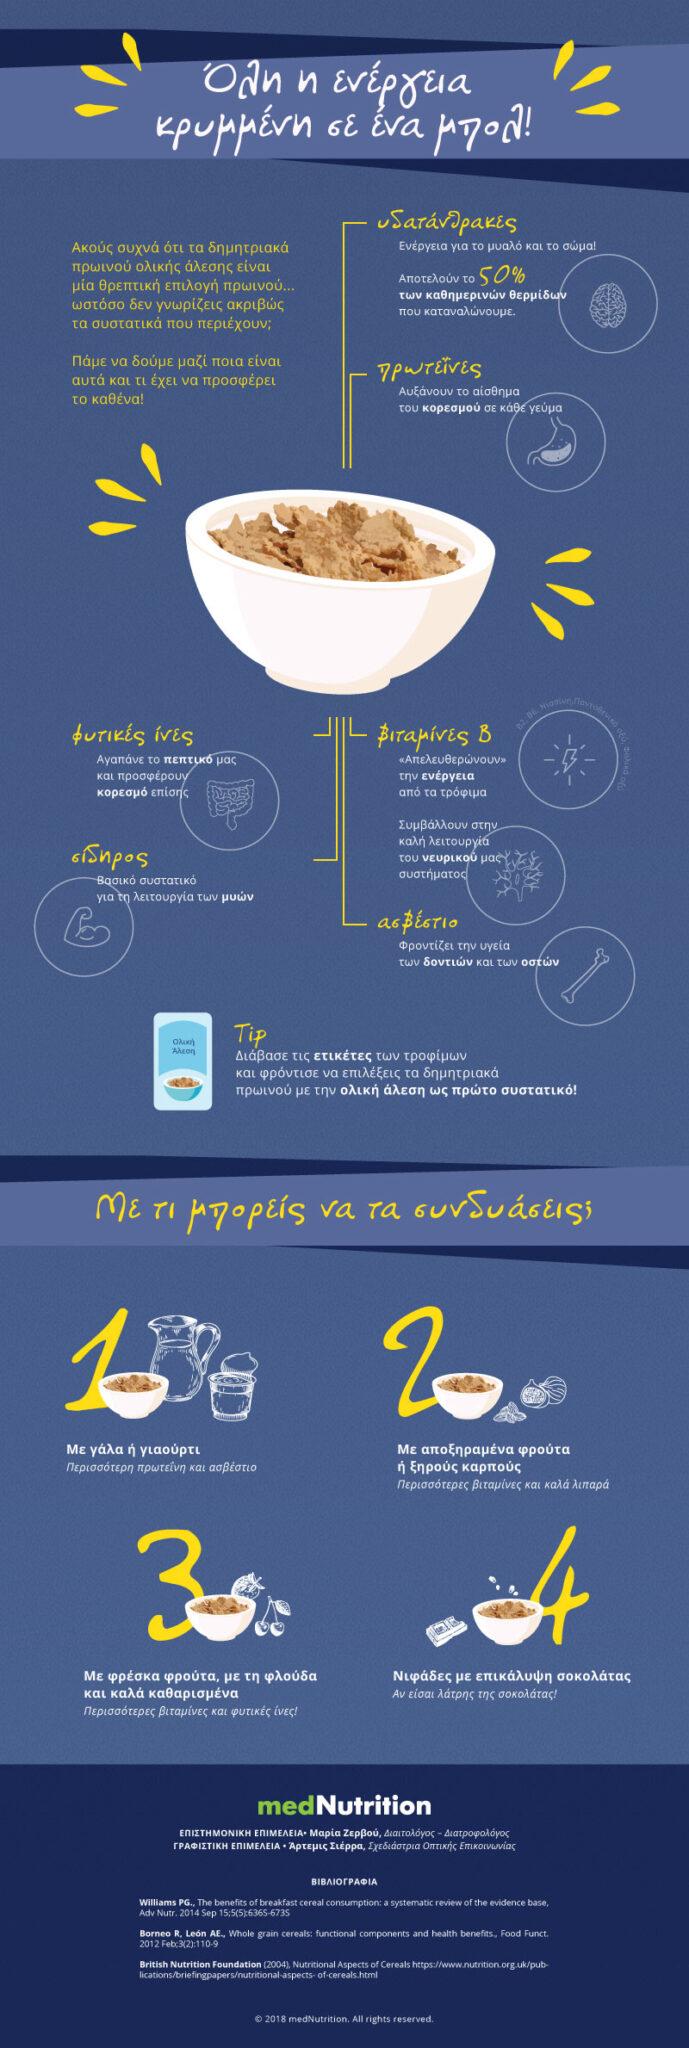 Infographic dimitriaka fitness fin